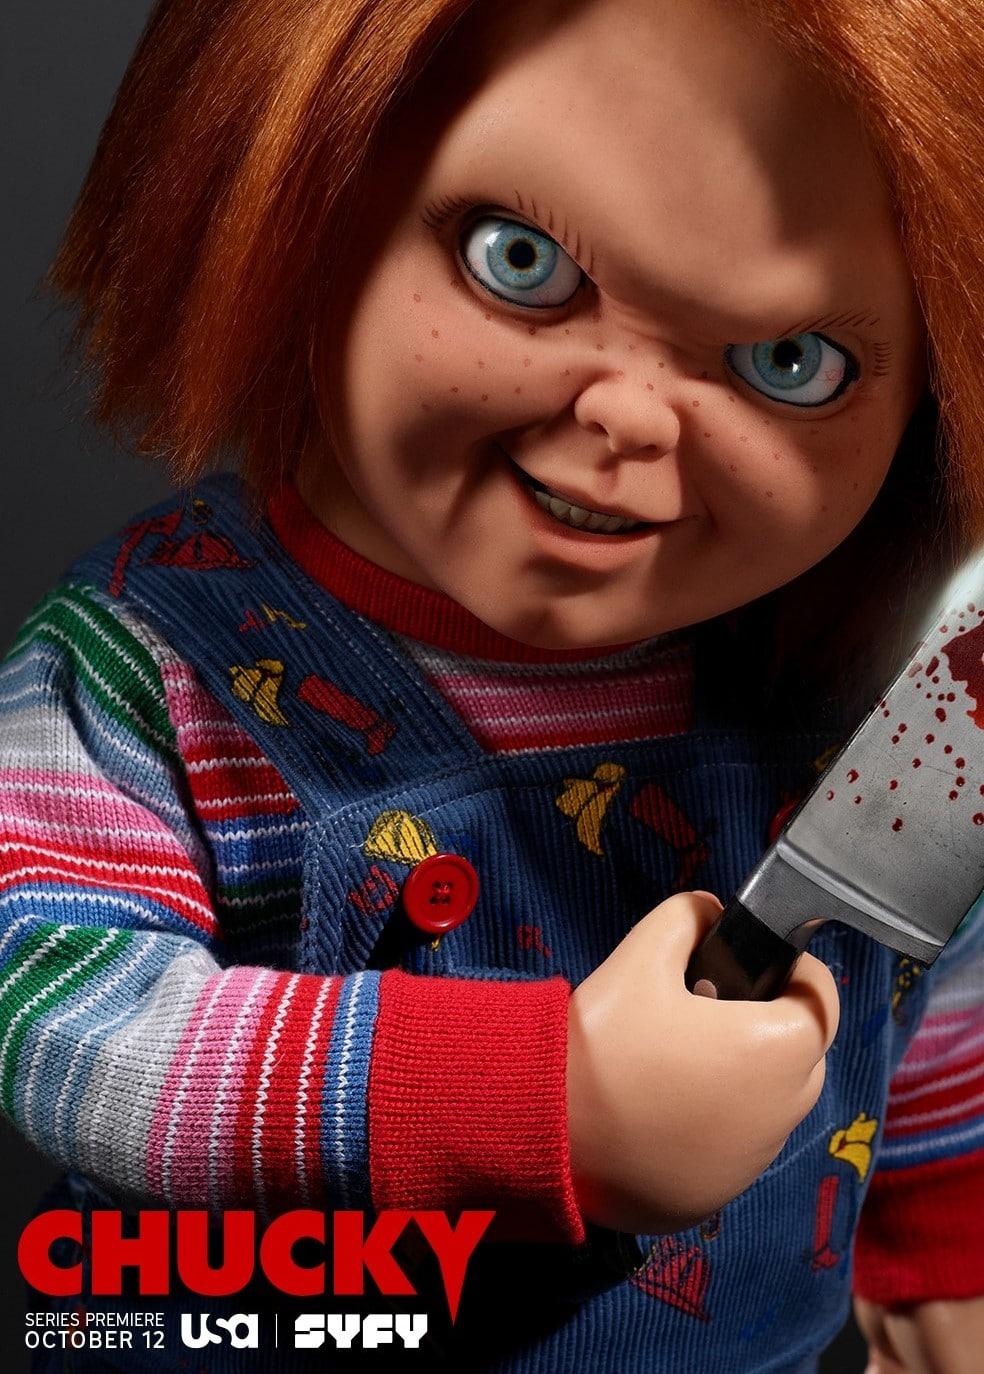 Chucky (Serie) – Teaser Poster